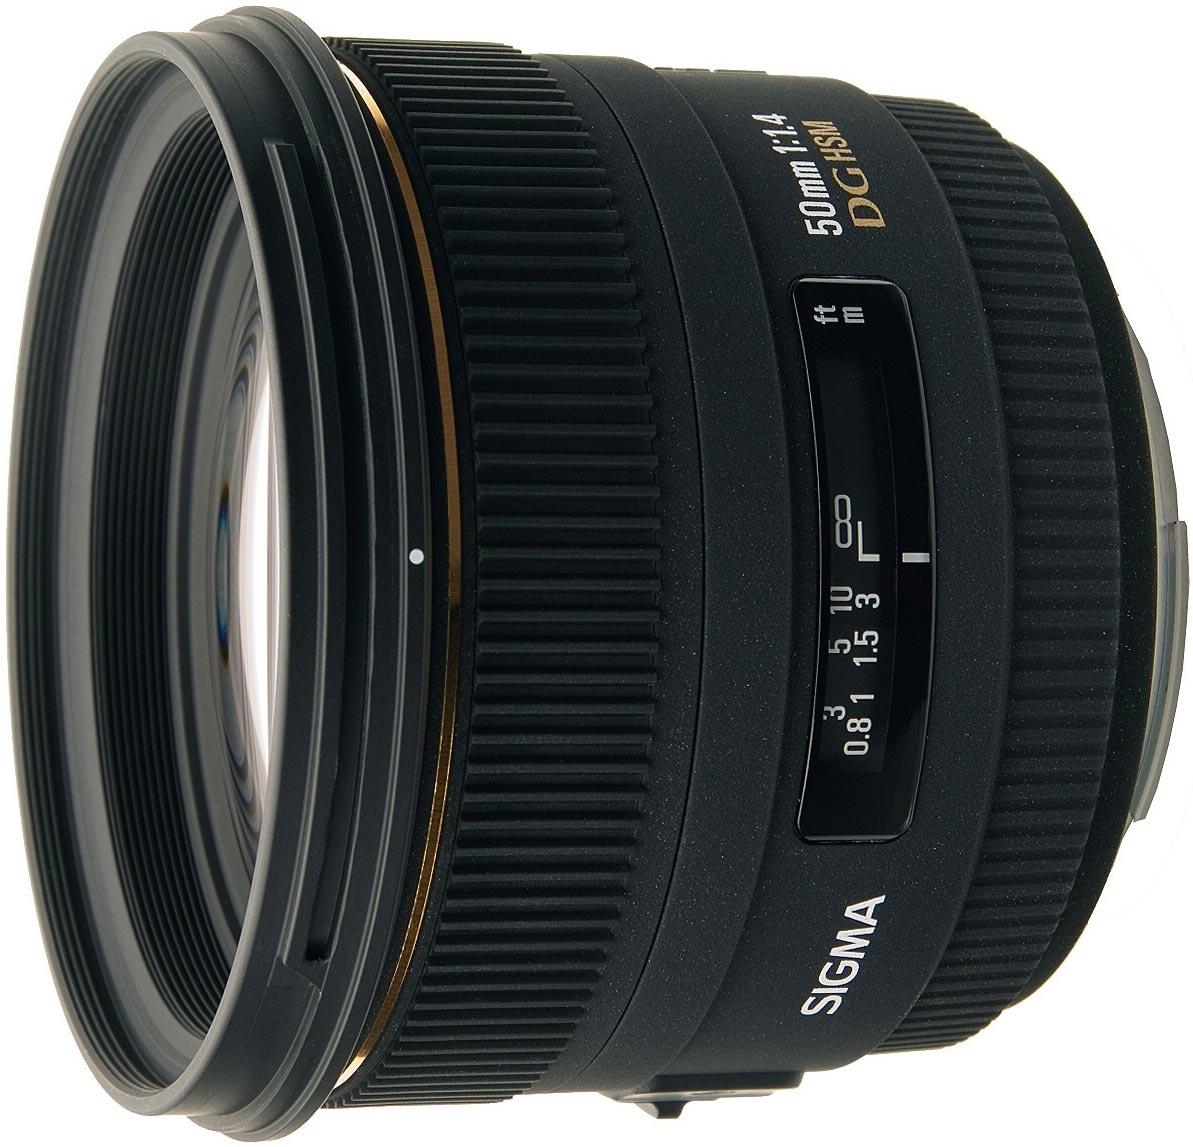 Sigma EX 50mm F1.4 DG HSM for Nikon,  8 Elements in 6 Groups foto objektīvs